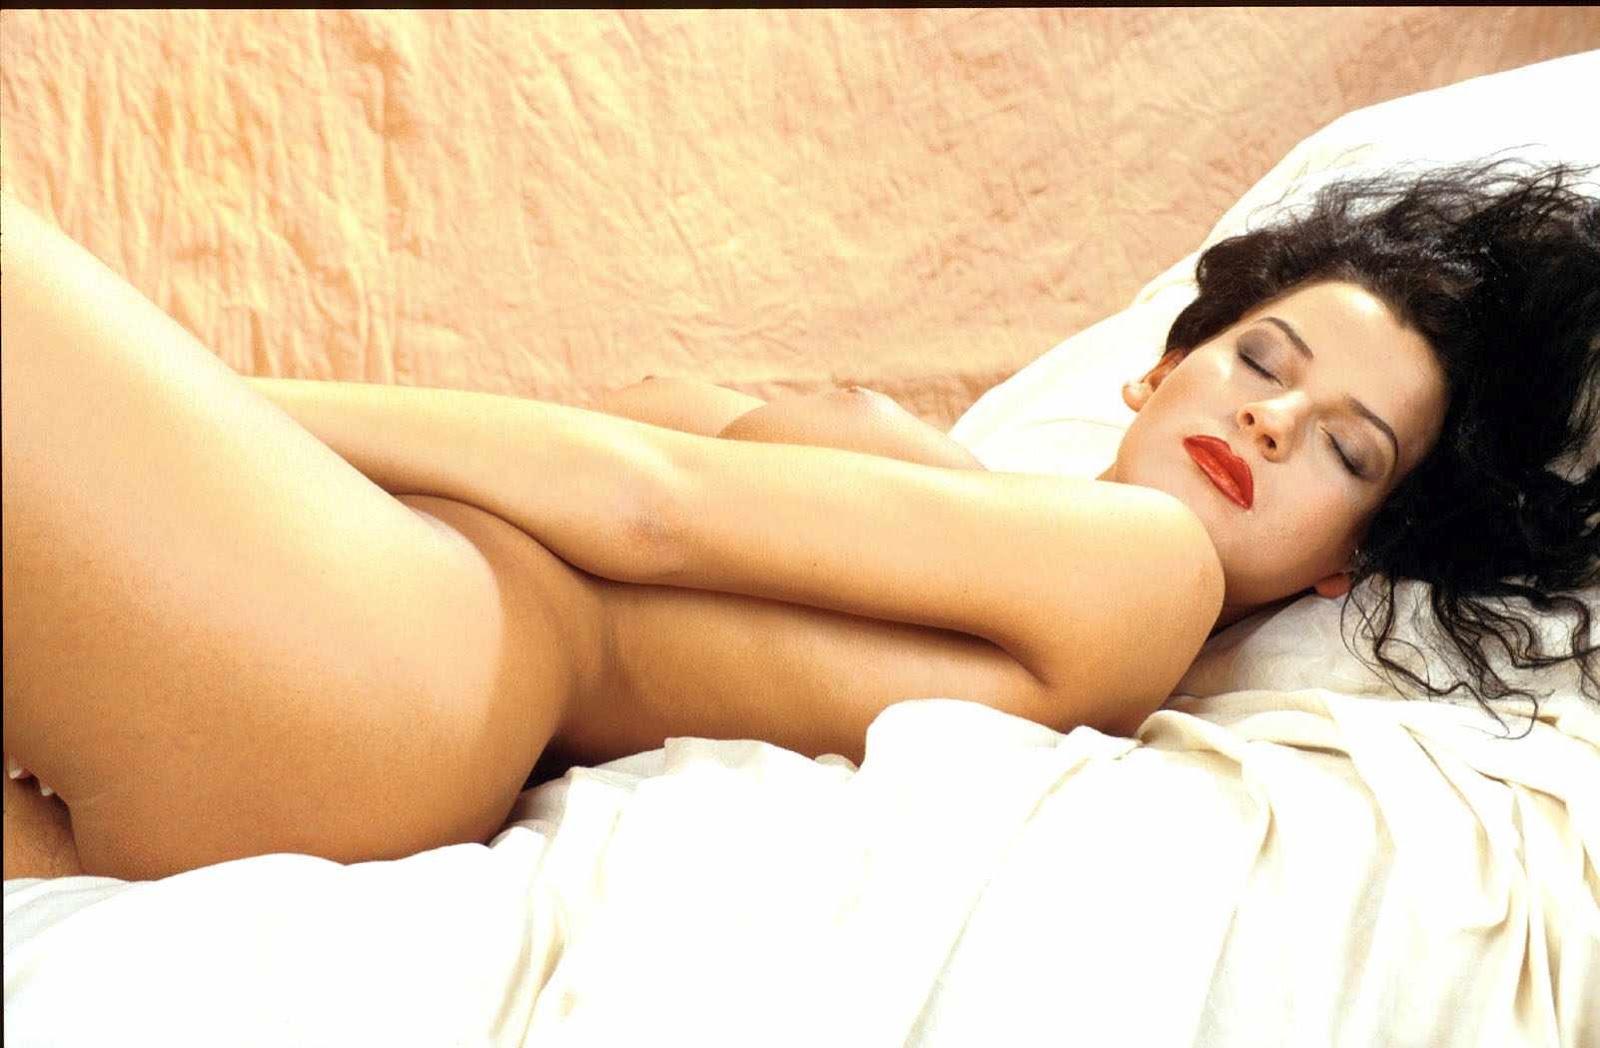 videos milf affamee exige sa dose de sexe quotidienne.